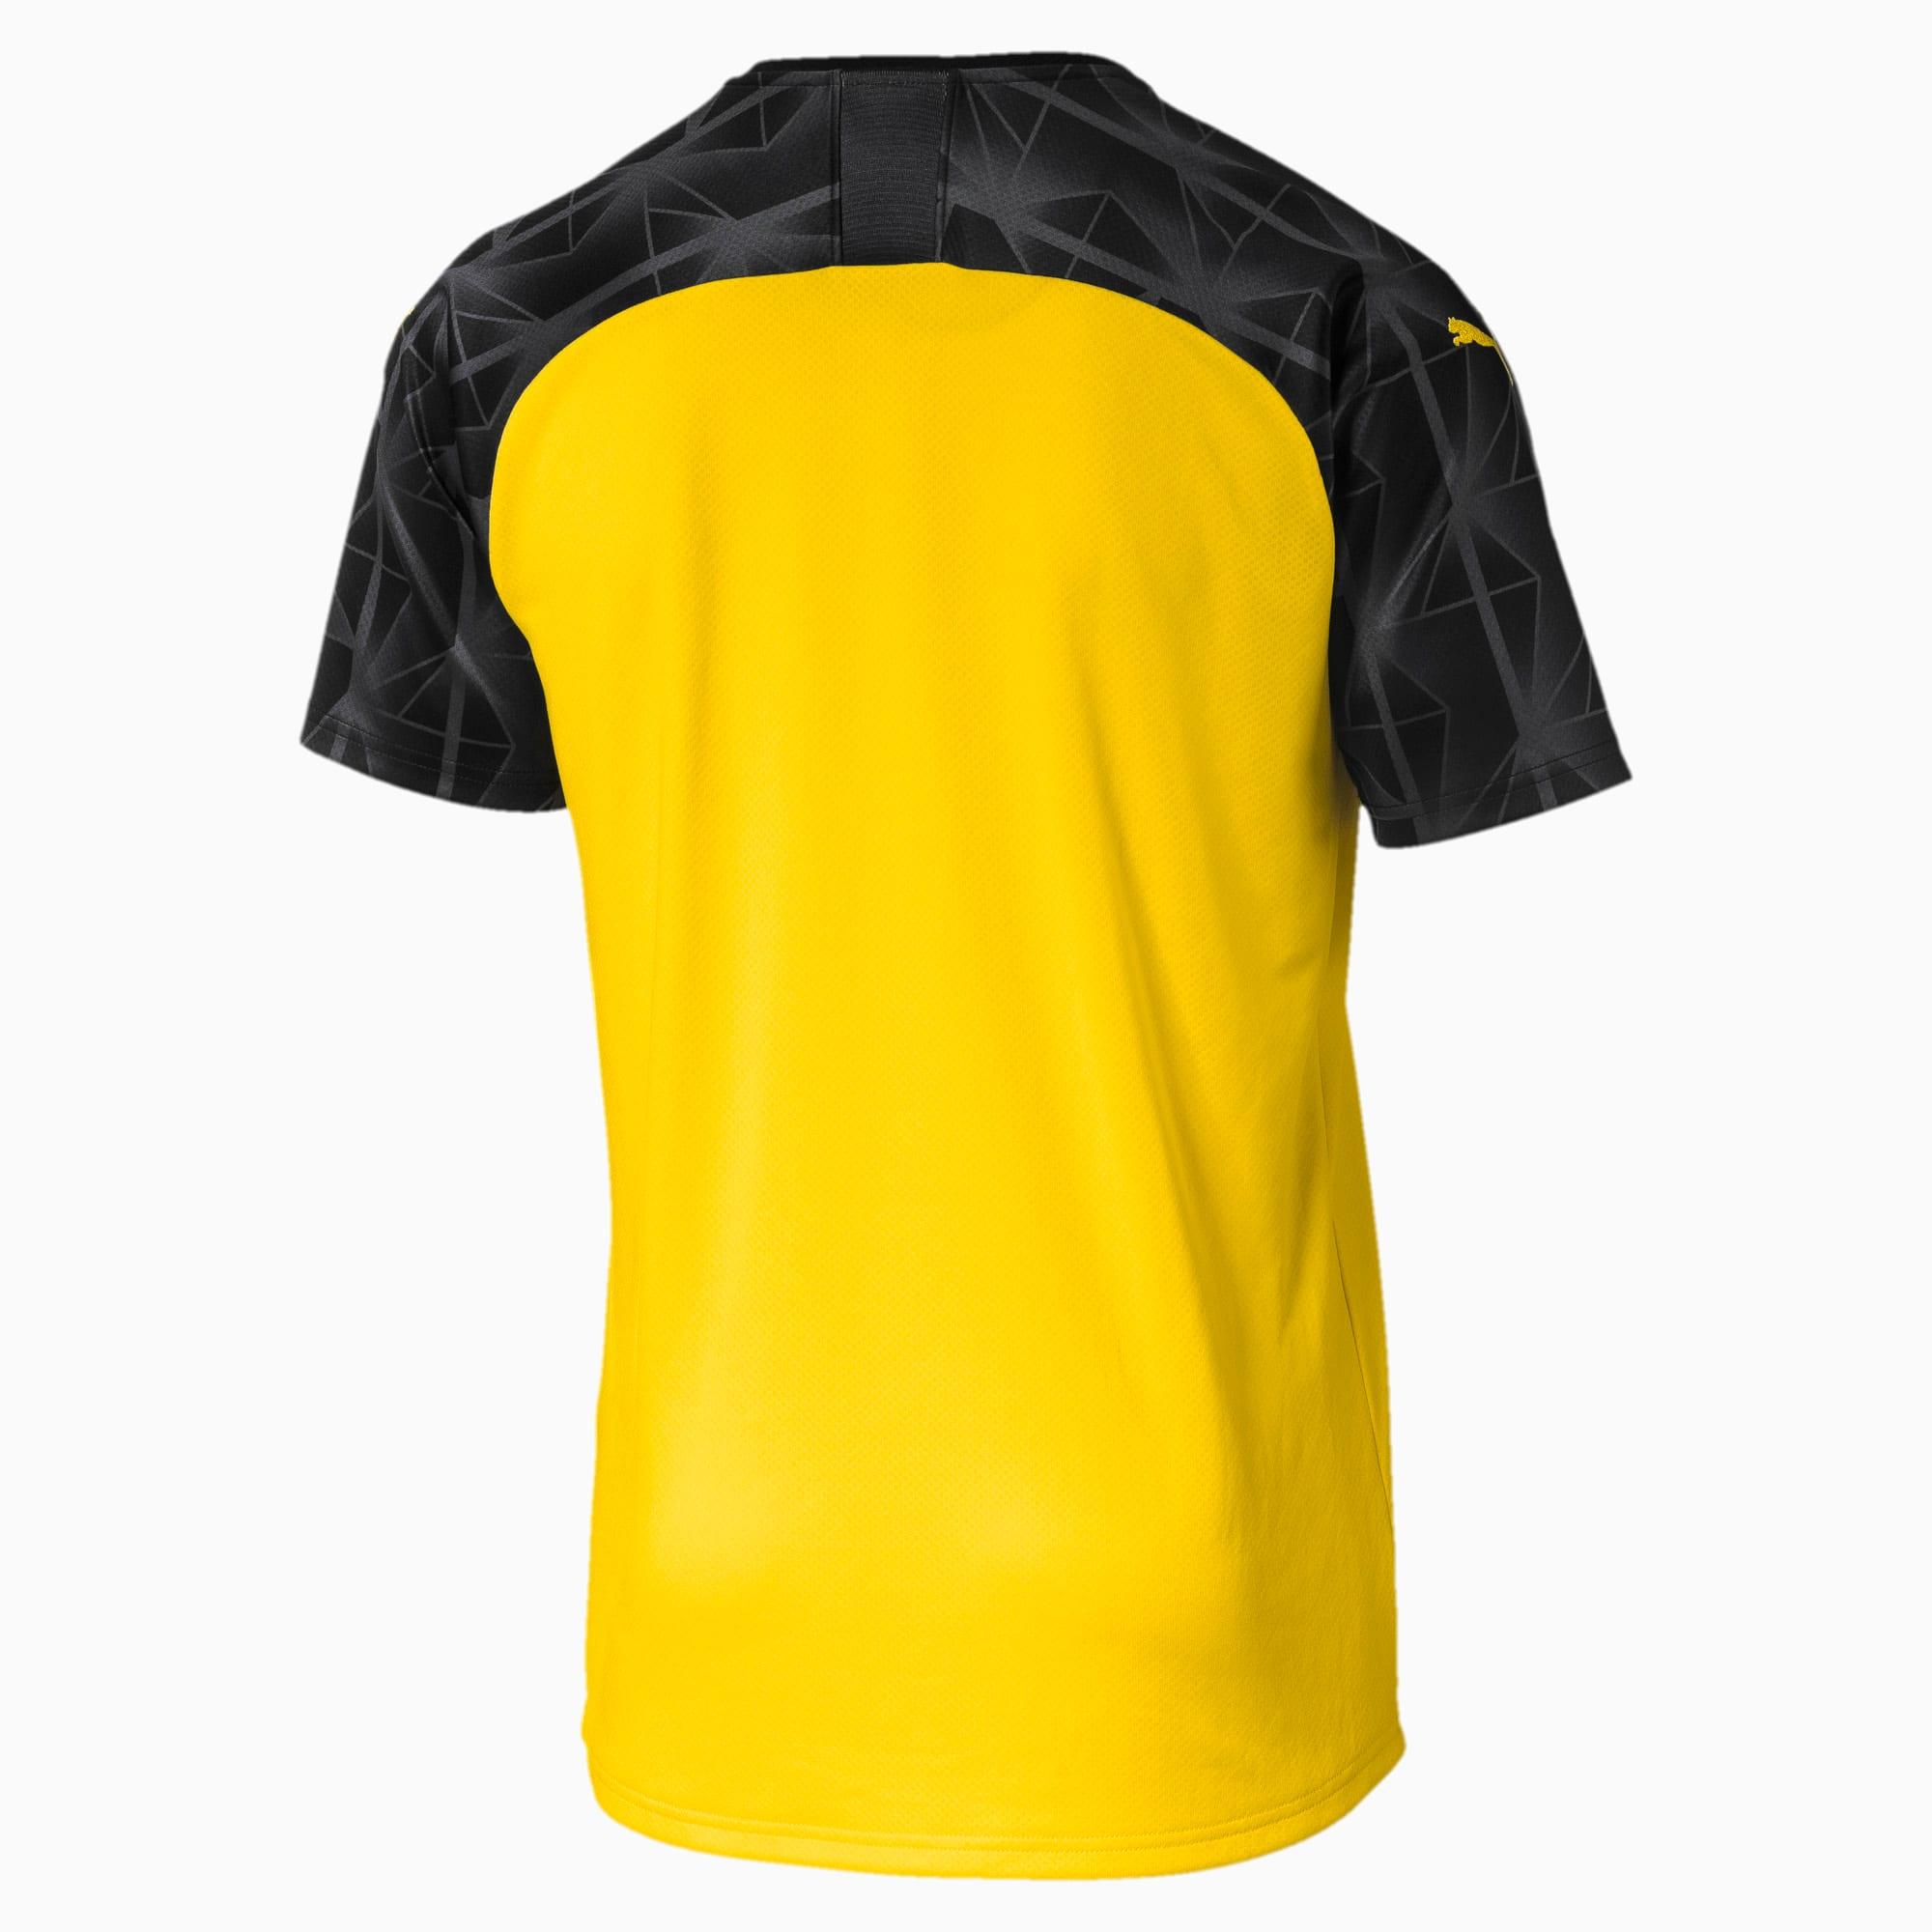 PUMA Mens Standard BVB Cup Shirt Replica with Evonik Logo